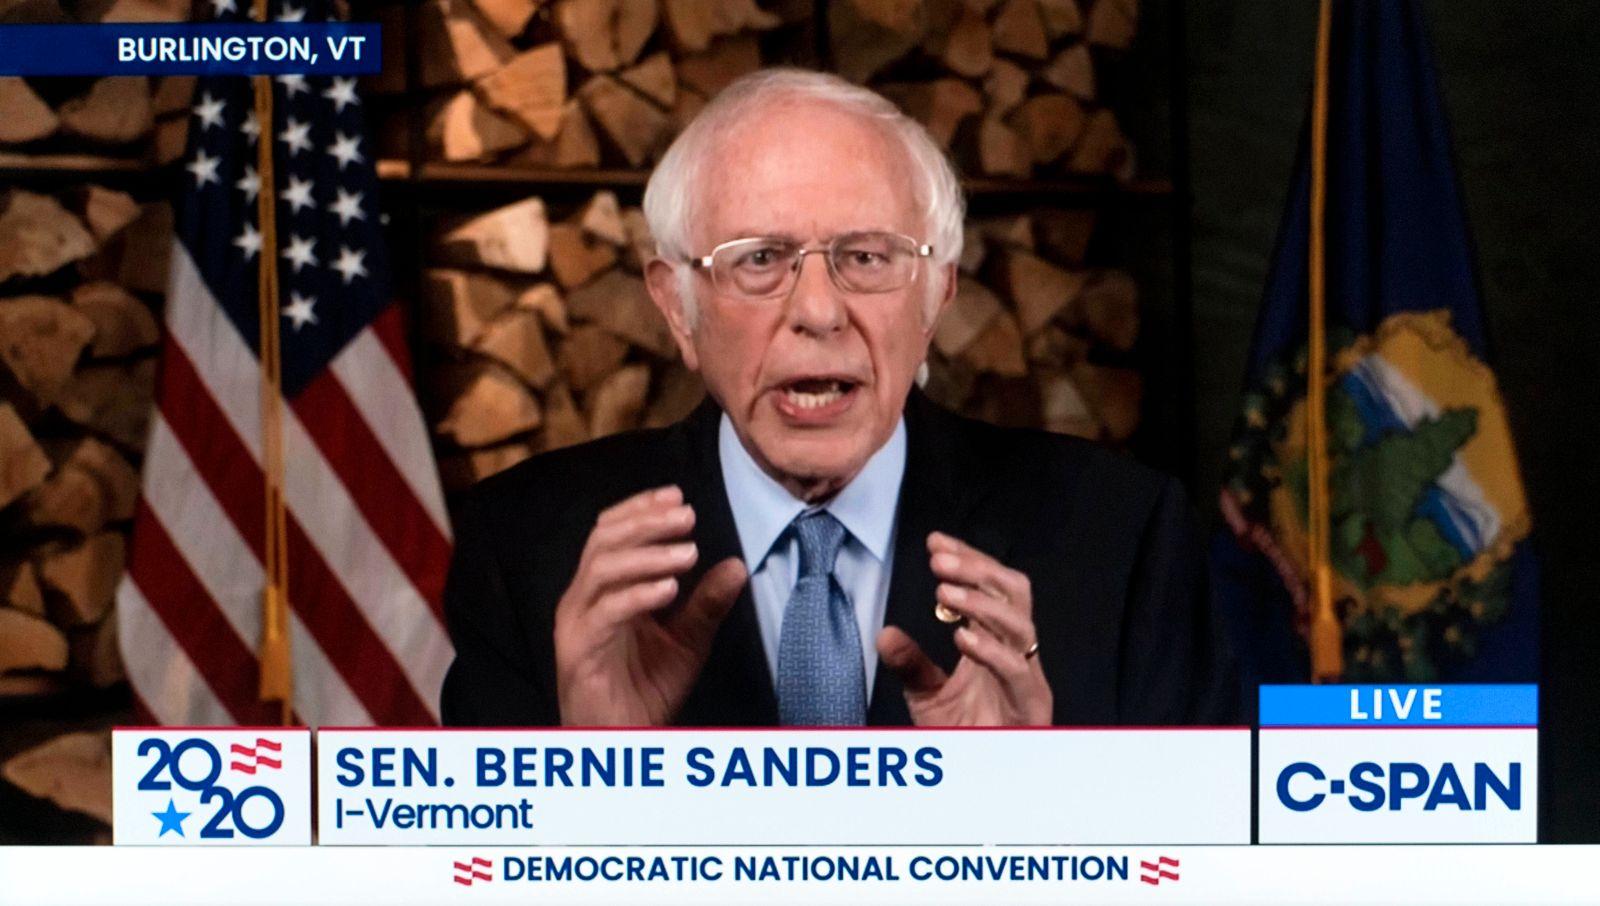 August 17, 2020 - Milwaukee, Wisconsin, U.S. - A screen grab from the C-SPAN coverage of Senator BERNIE SANDERS (I-VT)